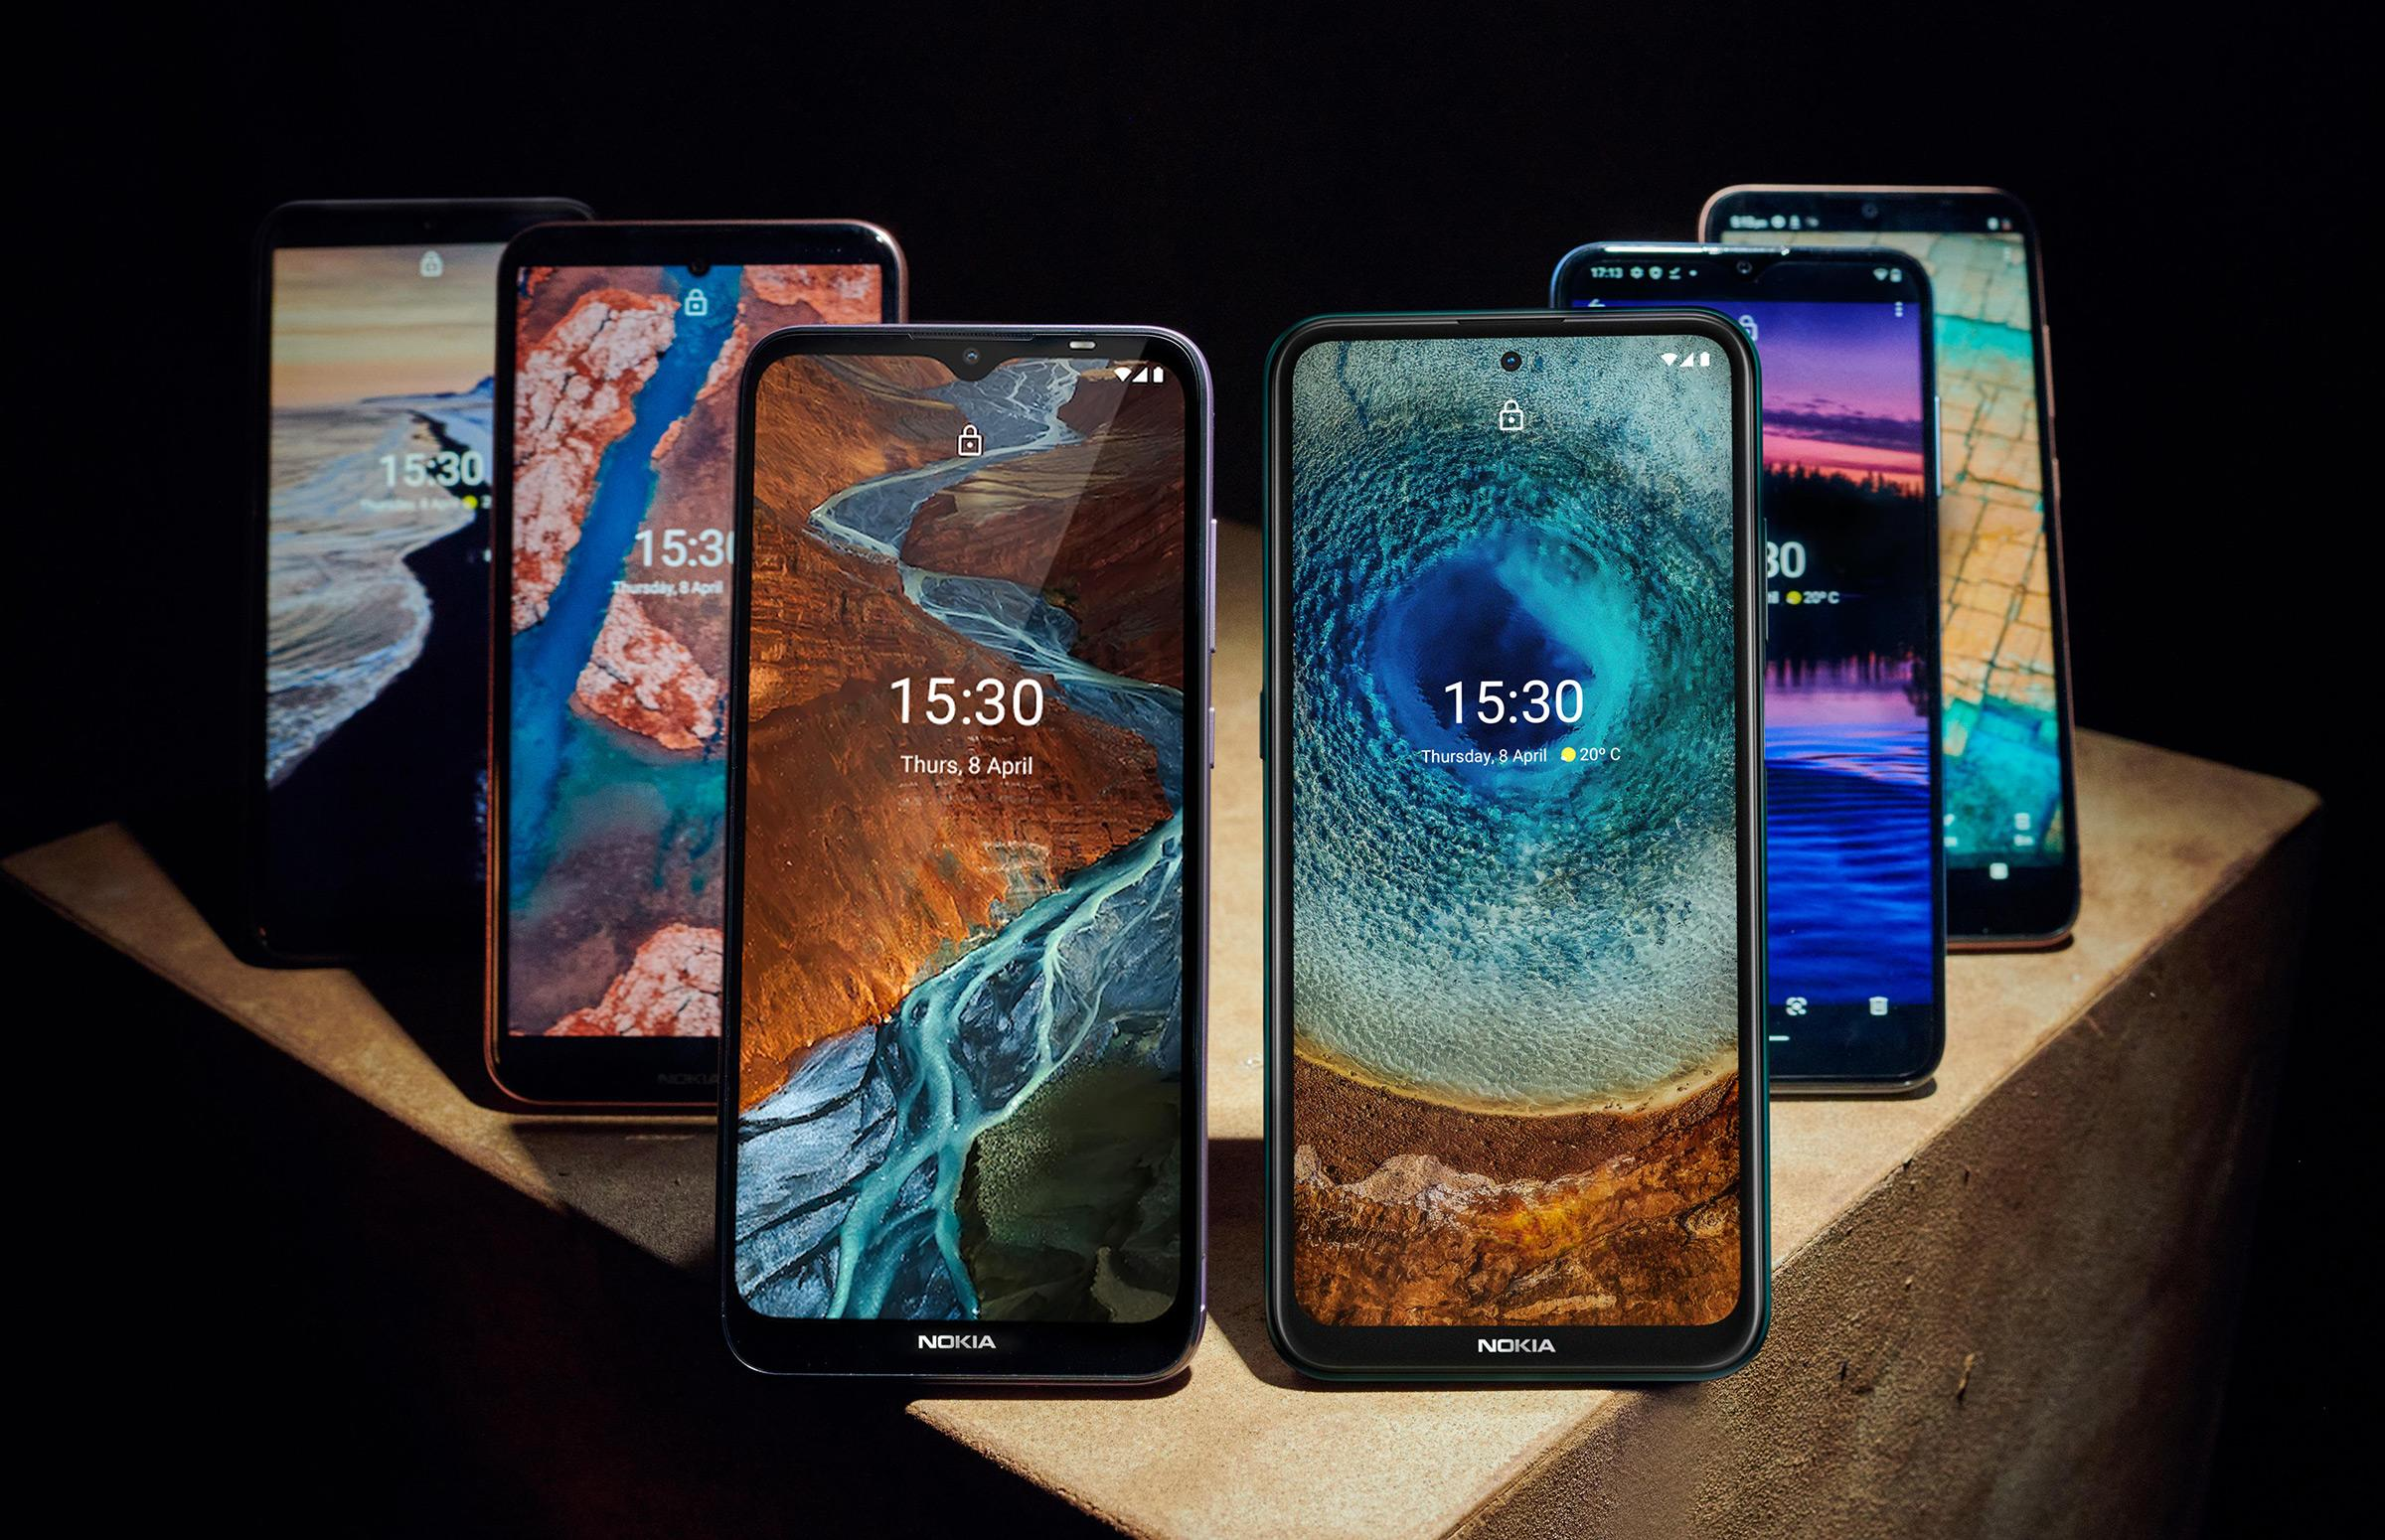 Nokia X, G, and C-series smartphones